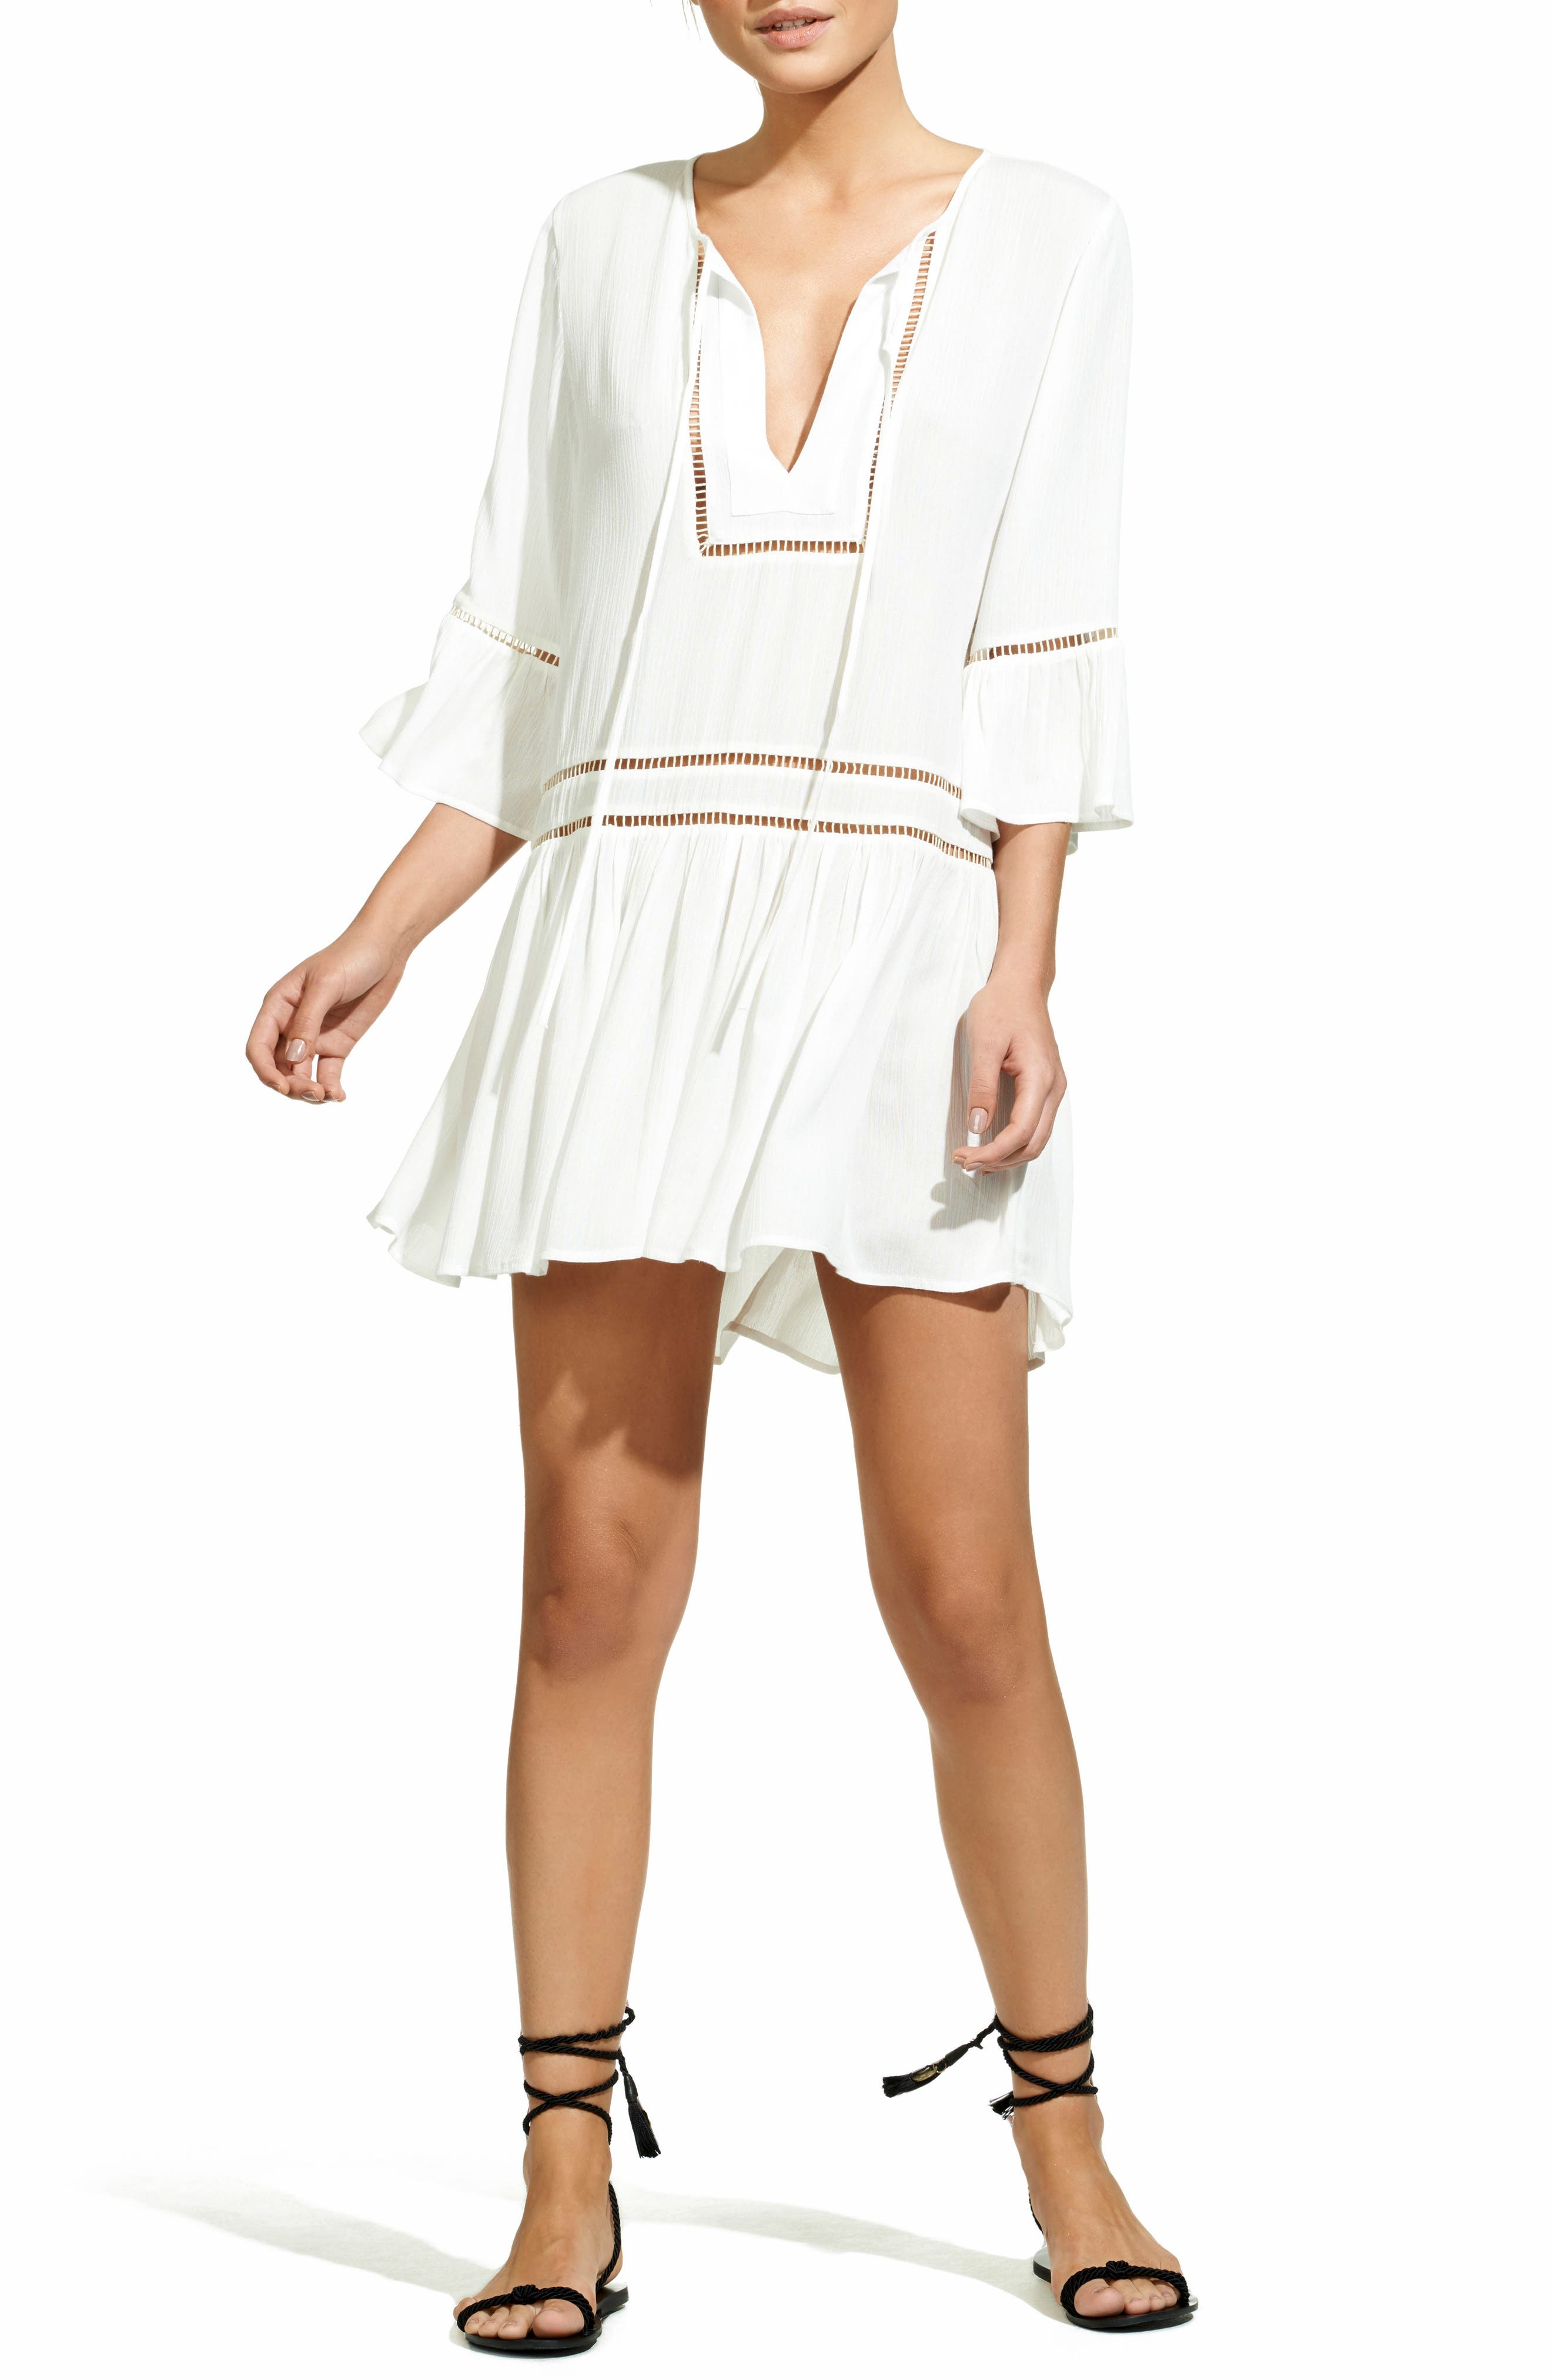 Main Image - ViX Swimwear Agatha Cover-Up Dress